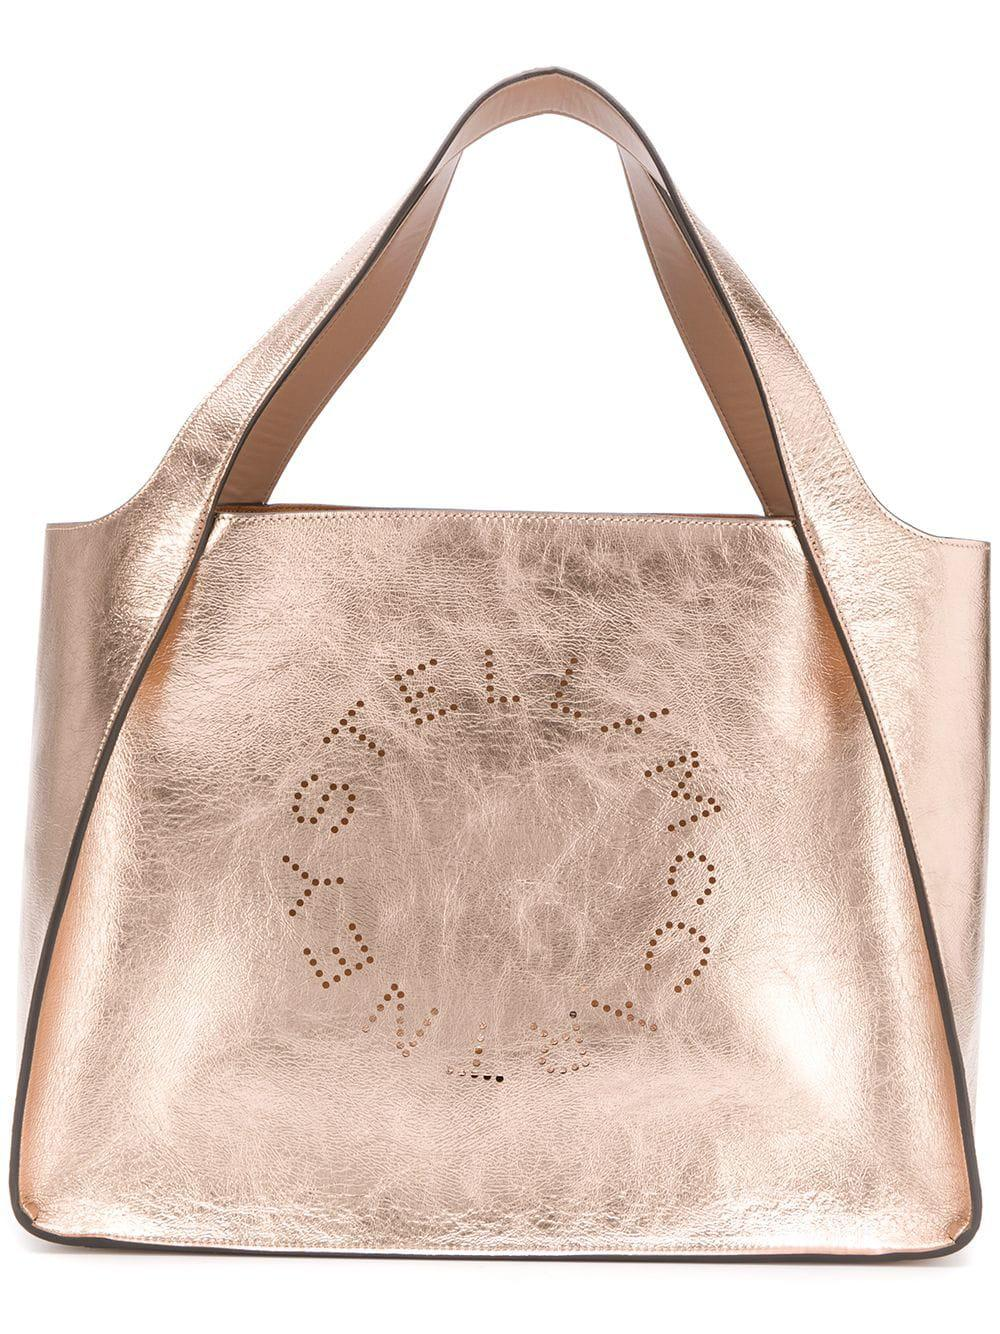 Lyst - Stella McCartney Stella Logo Tote Bag in Metallic - Save 30% a35bdb5136580